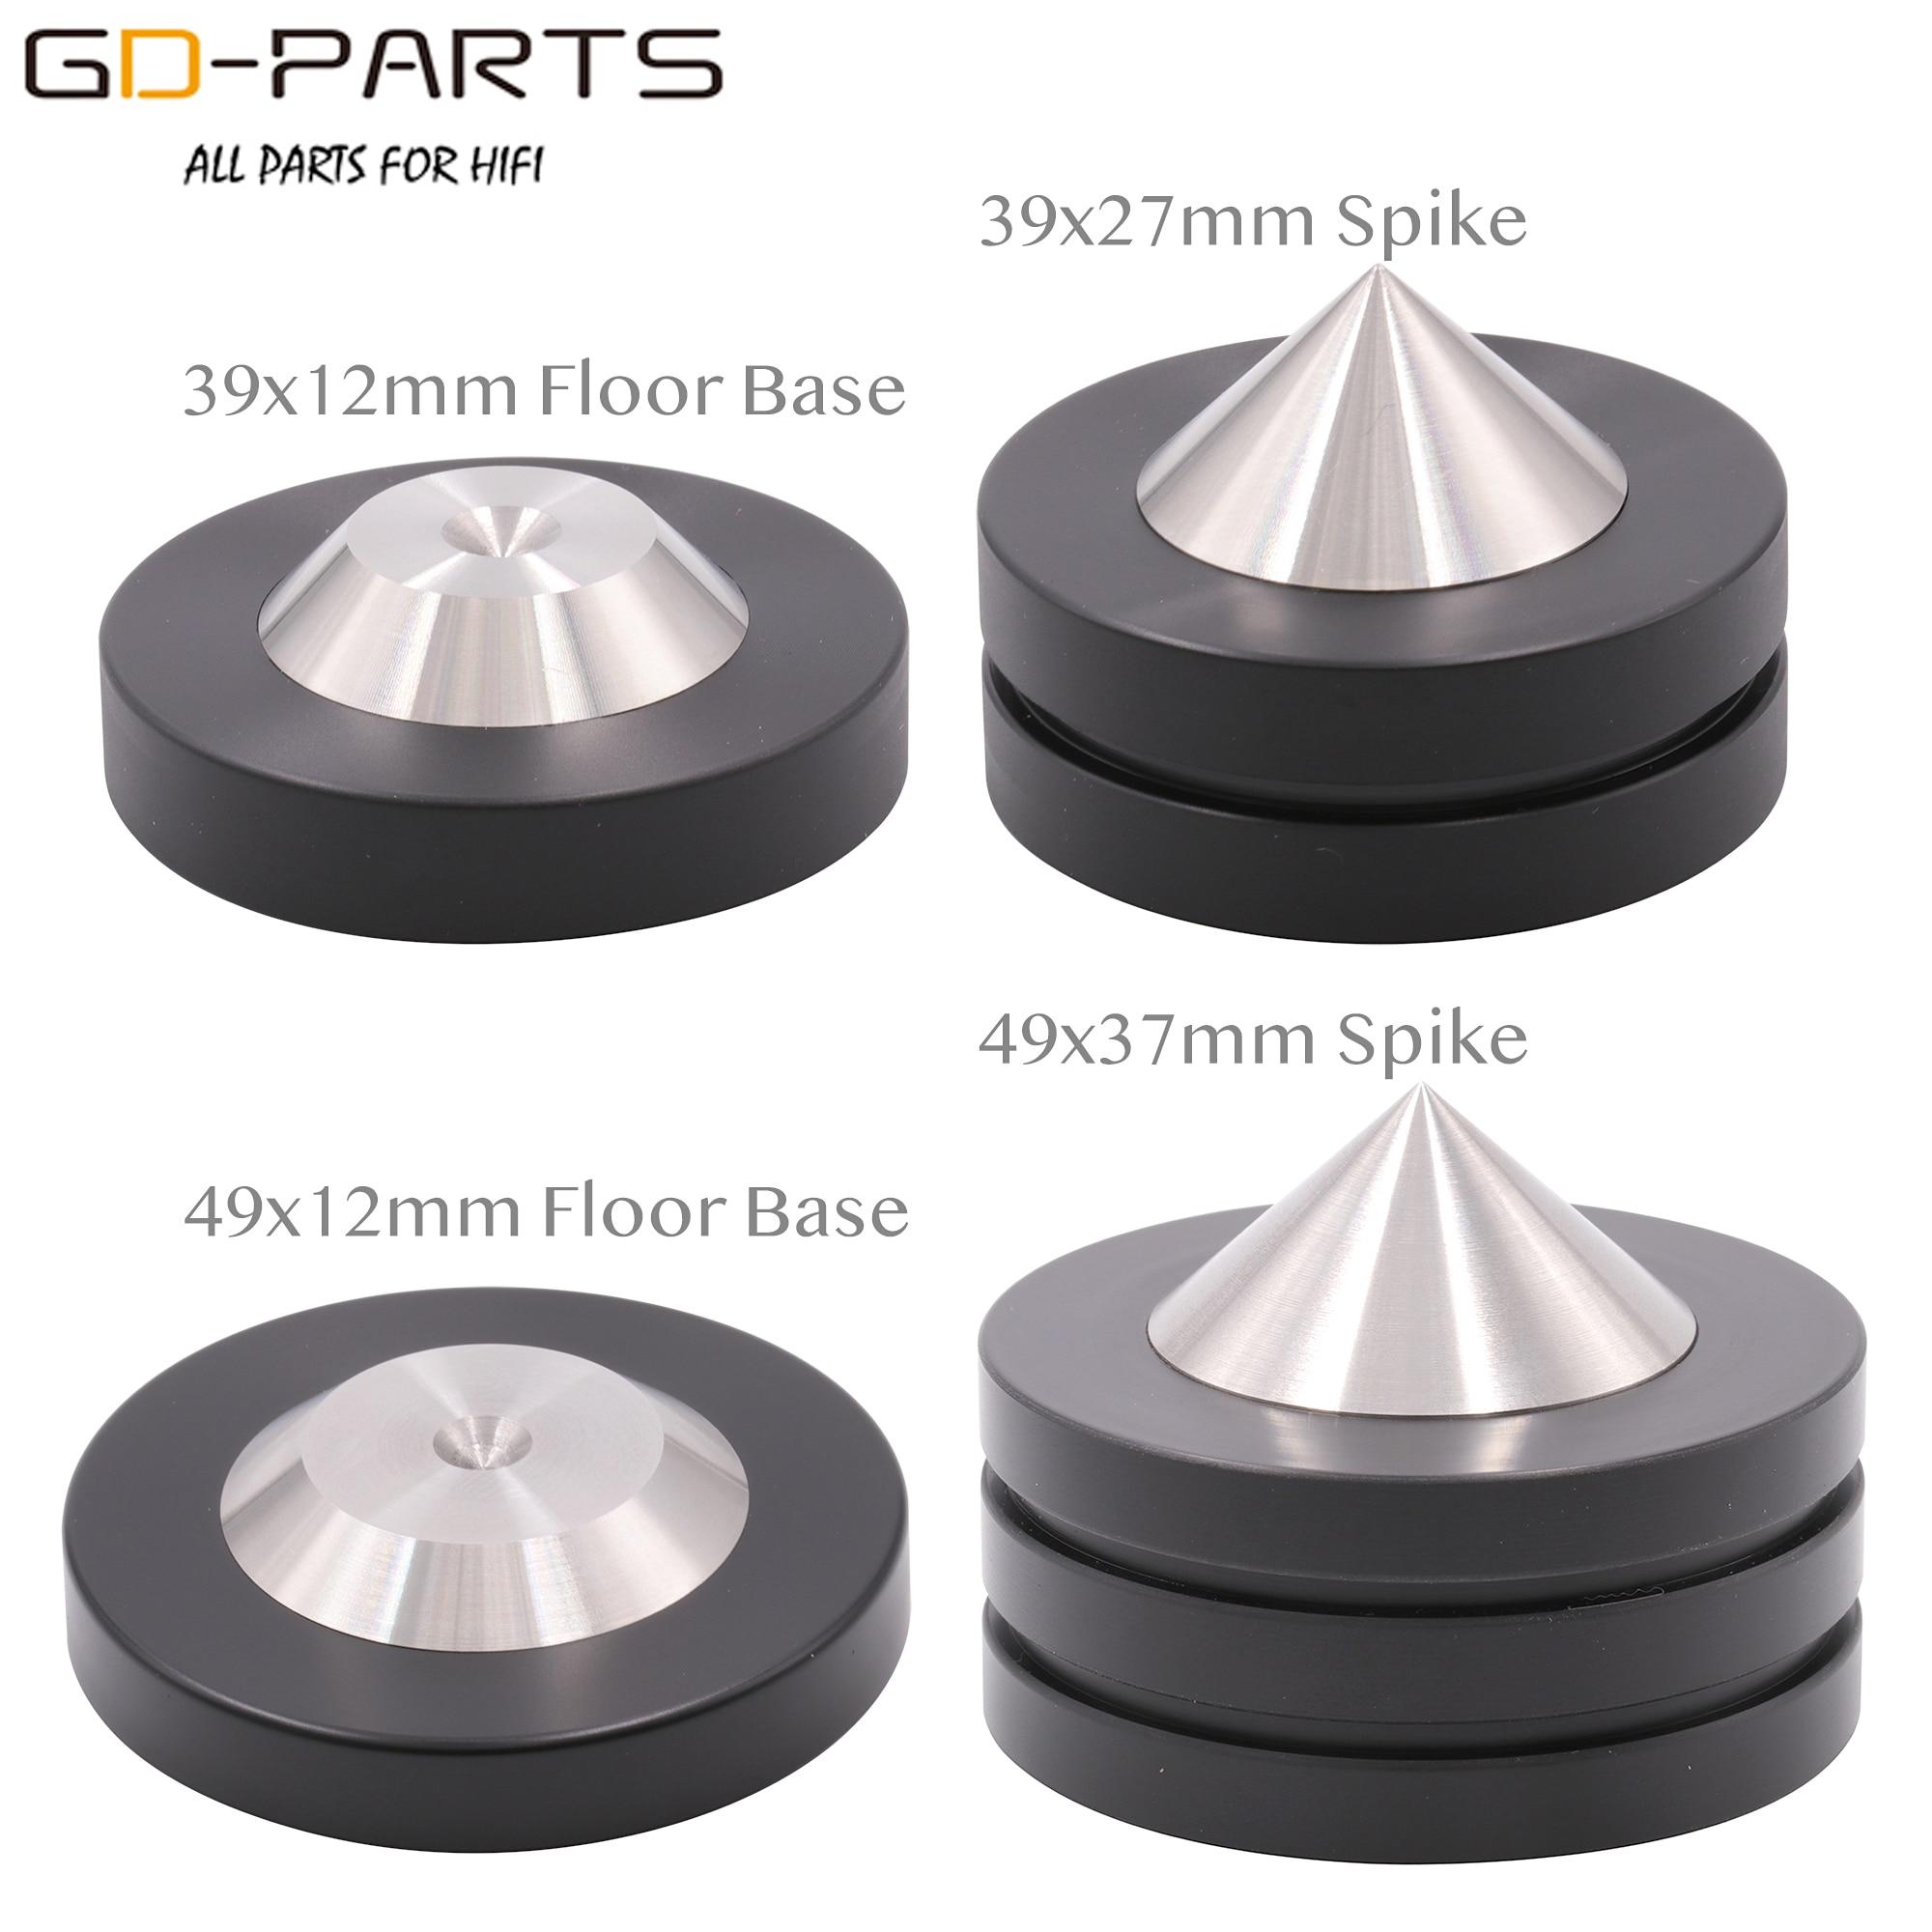 39mm 49mm*12mm 304 Stainless Steel Graphite Speaker AMP Isolation Spike Pad Preamp DAC LP CD Mat Floor Base HIFI AUDIO DIY 4PCS